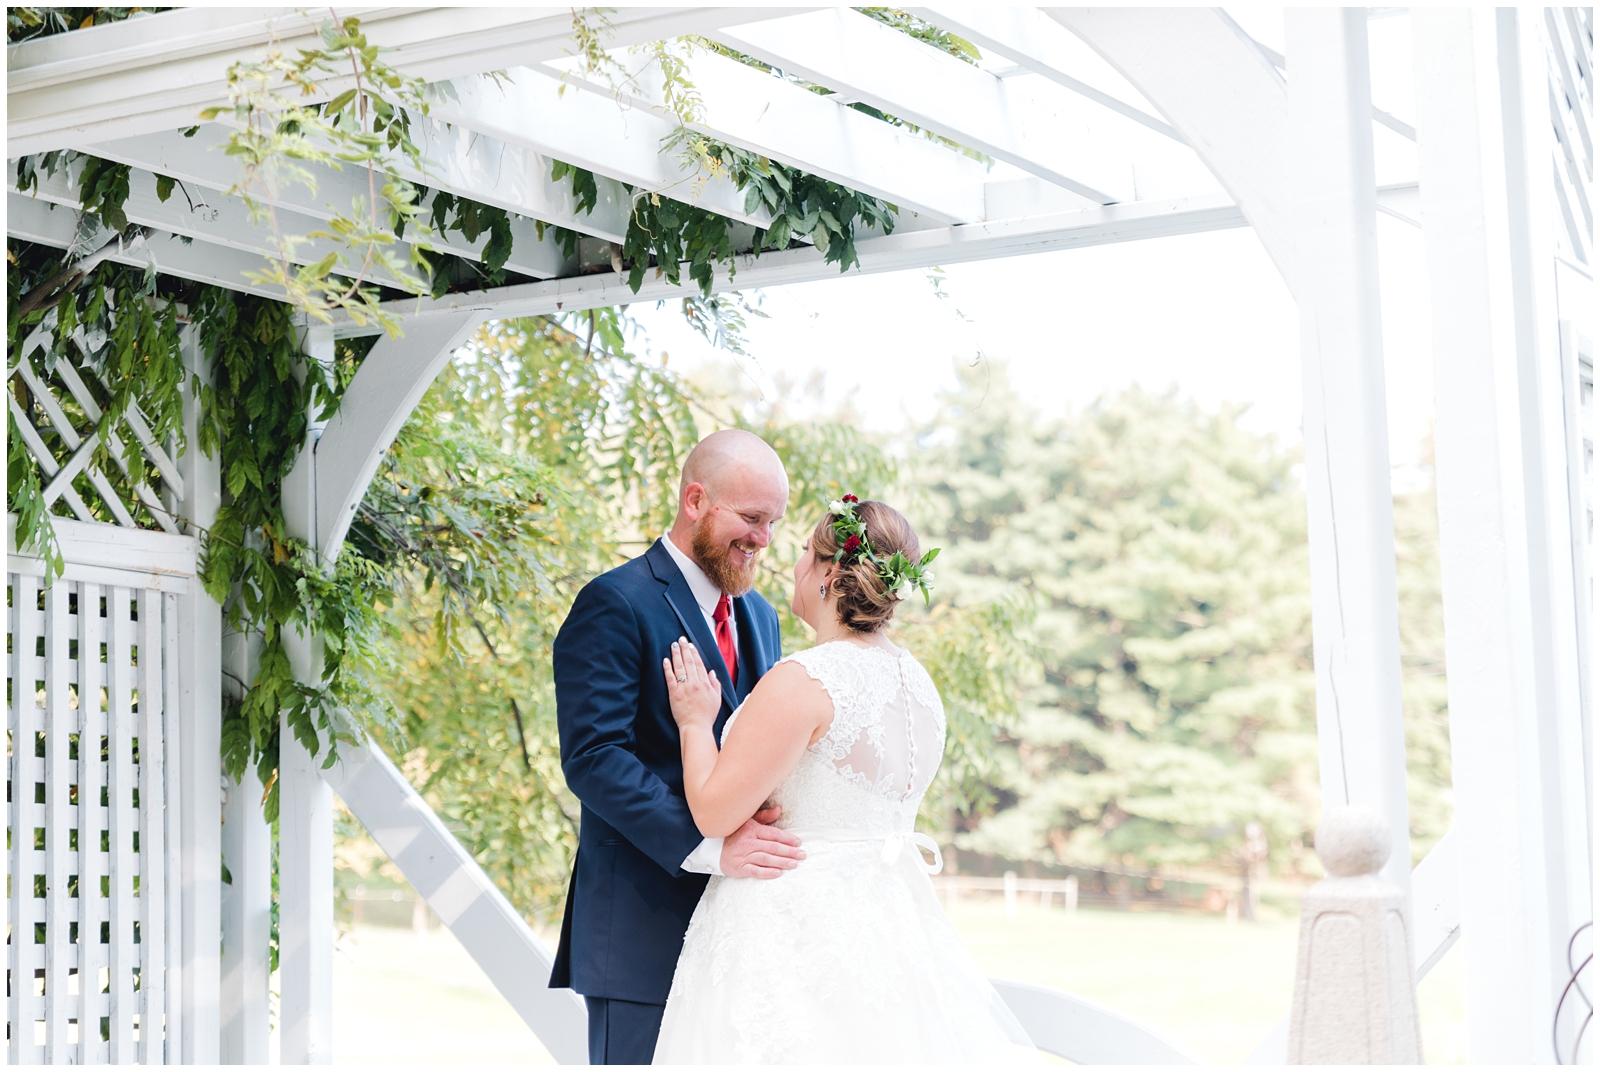 lancaster-ohio-fall-wedding-lra-photo_0011.jpg